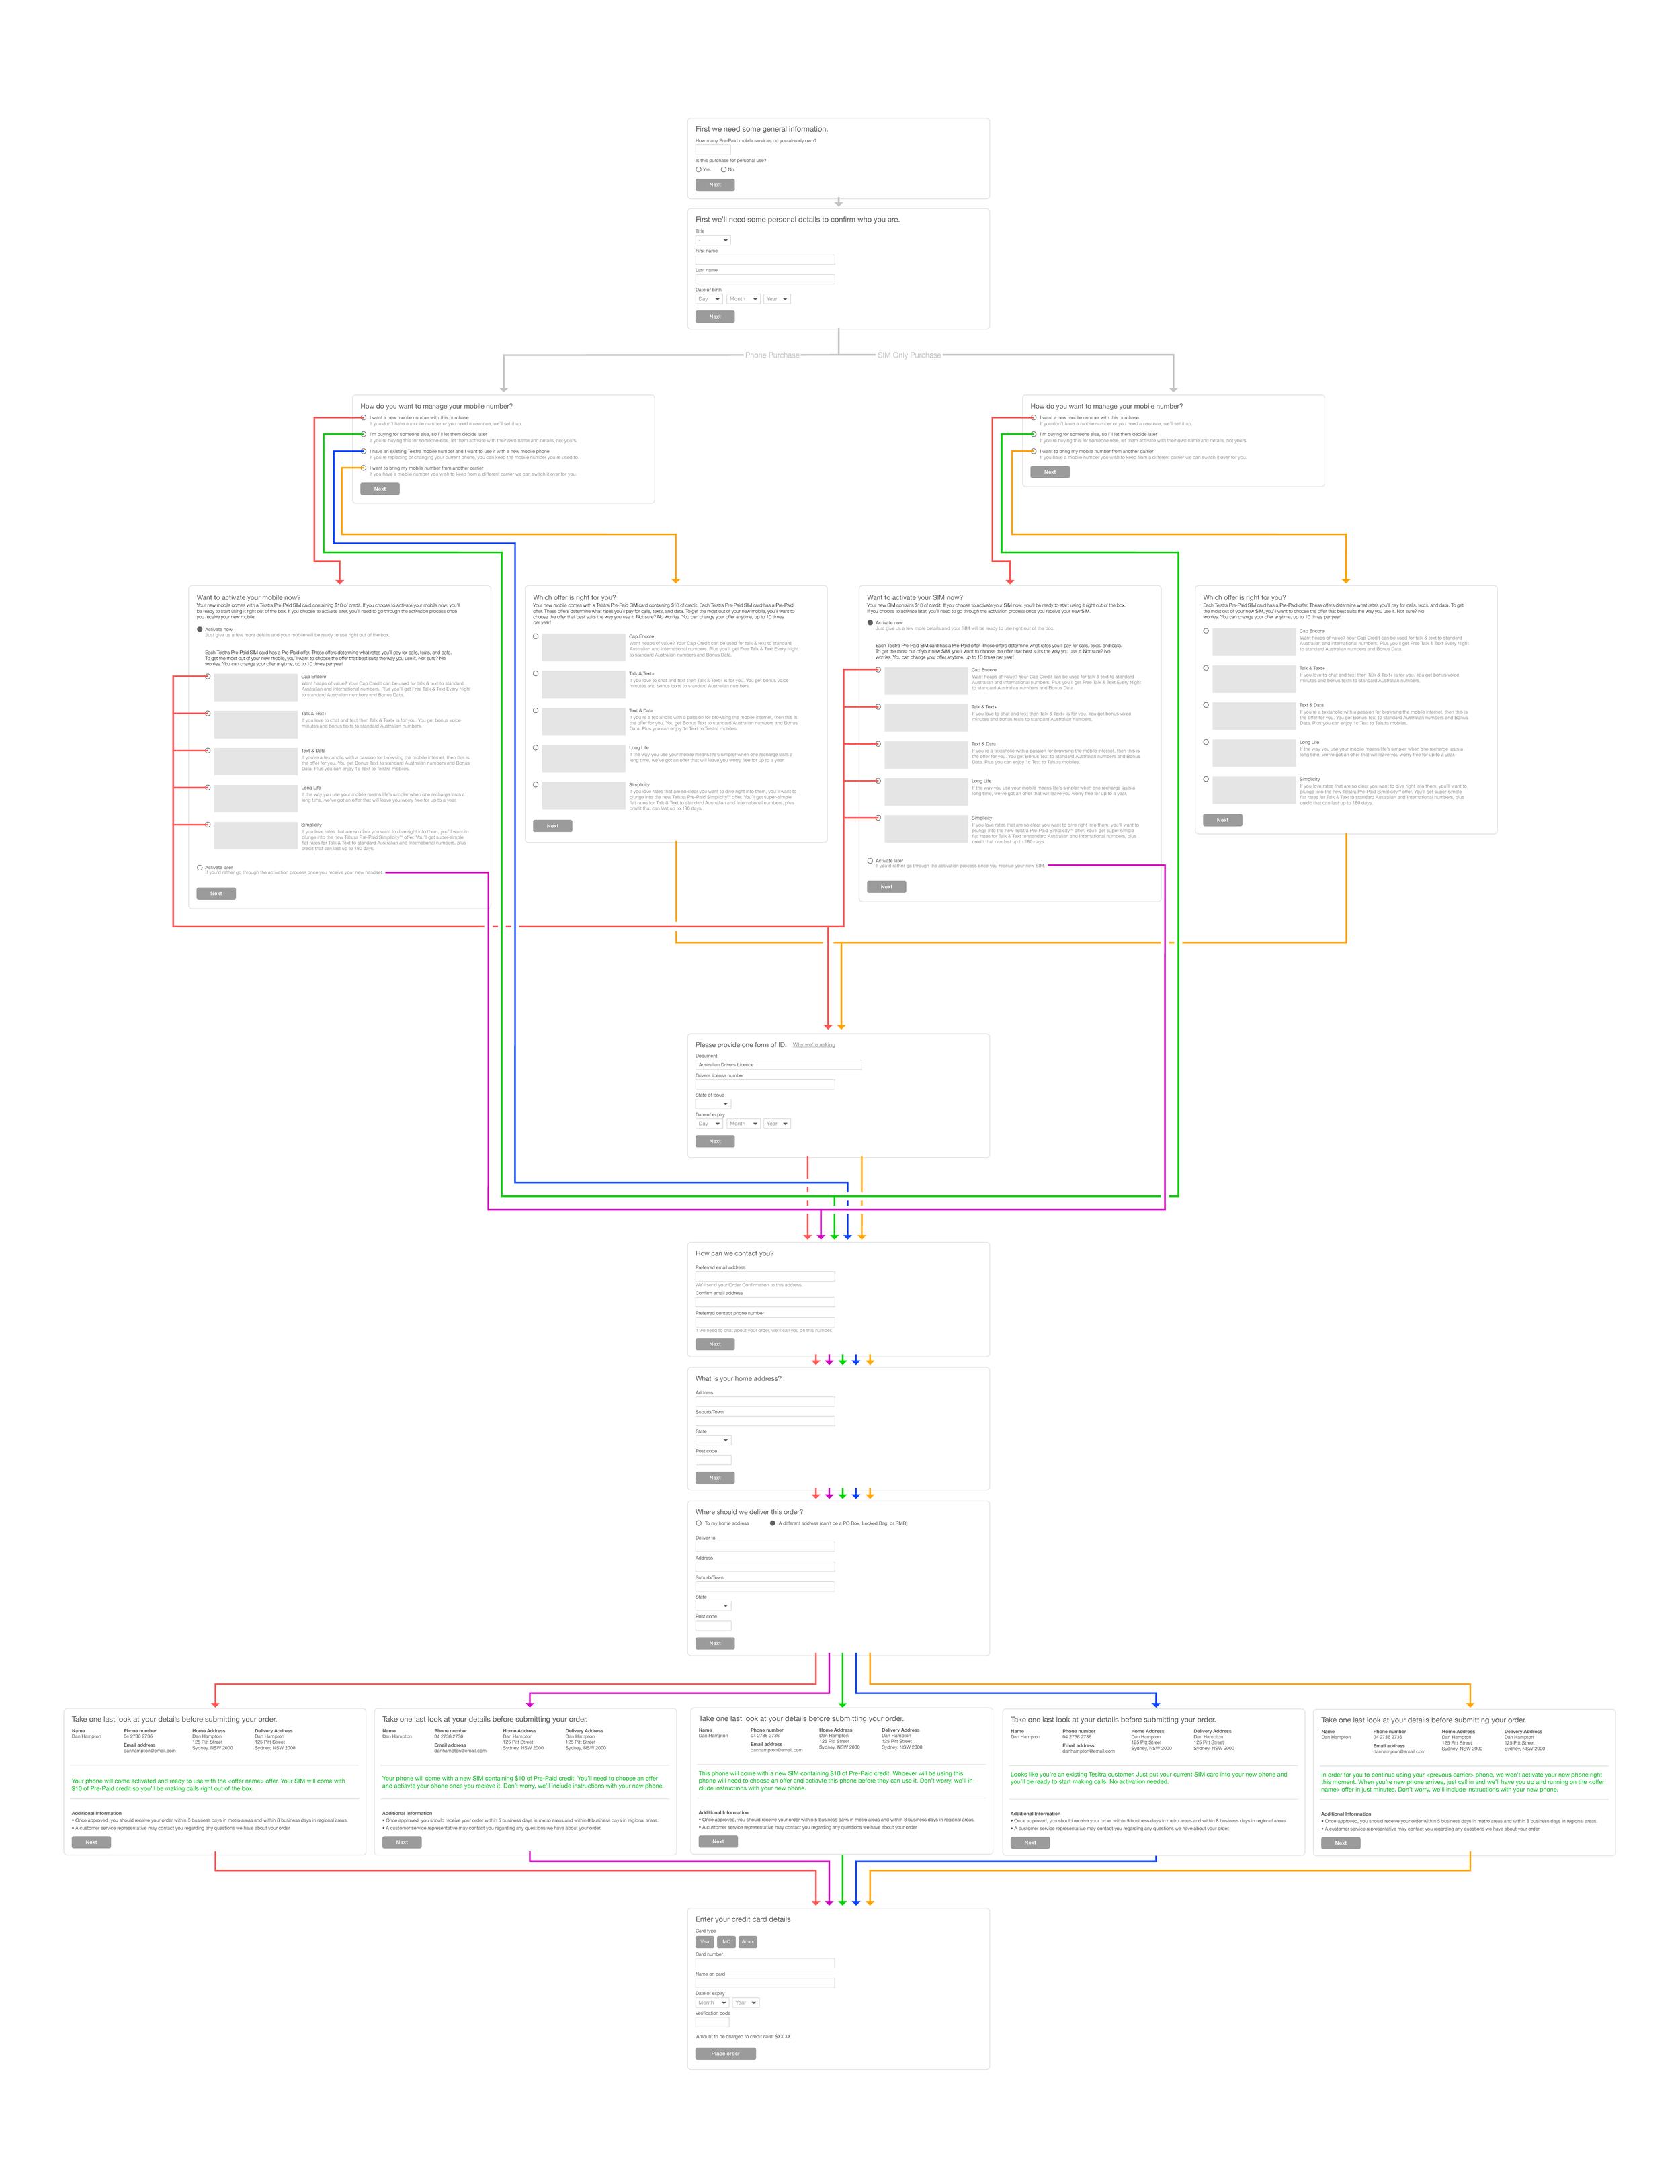 Check-out flow diagram